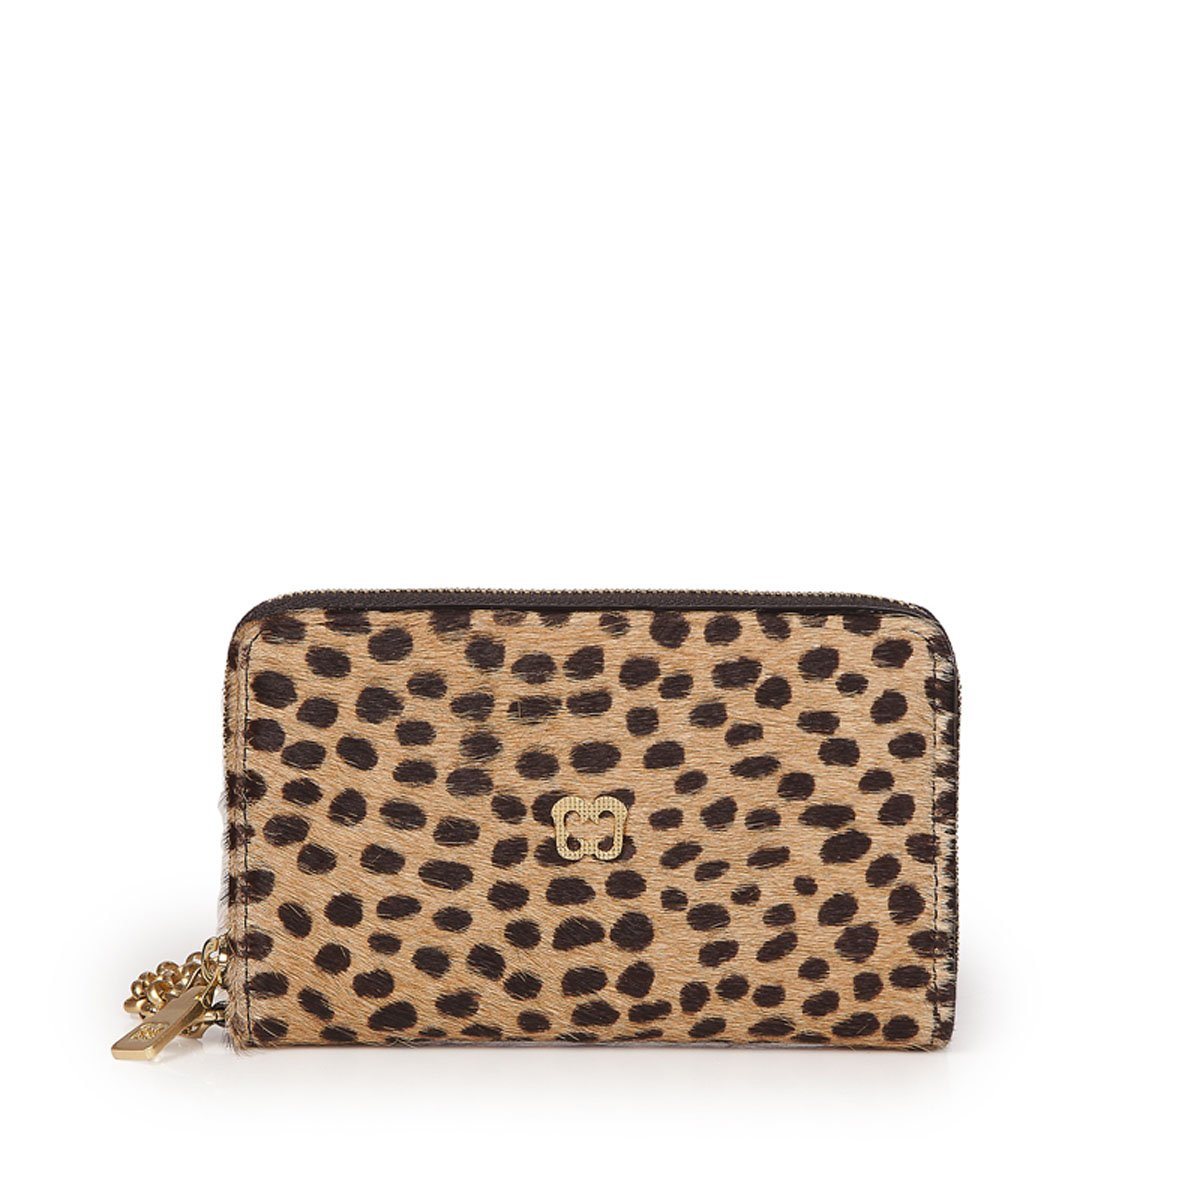 Eric Javits Luxury Fashion Designer Women's Handbag - Smartphone Wristlet - Cheeta Black